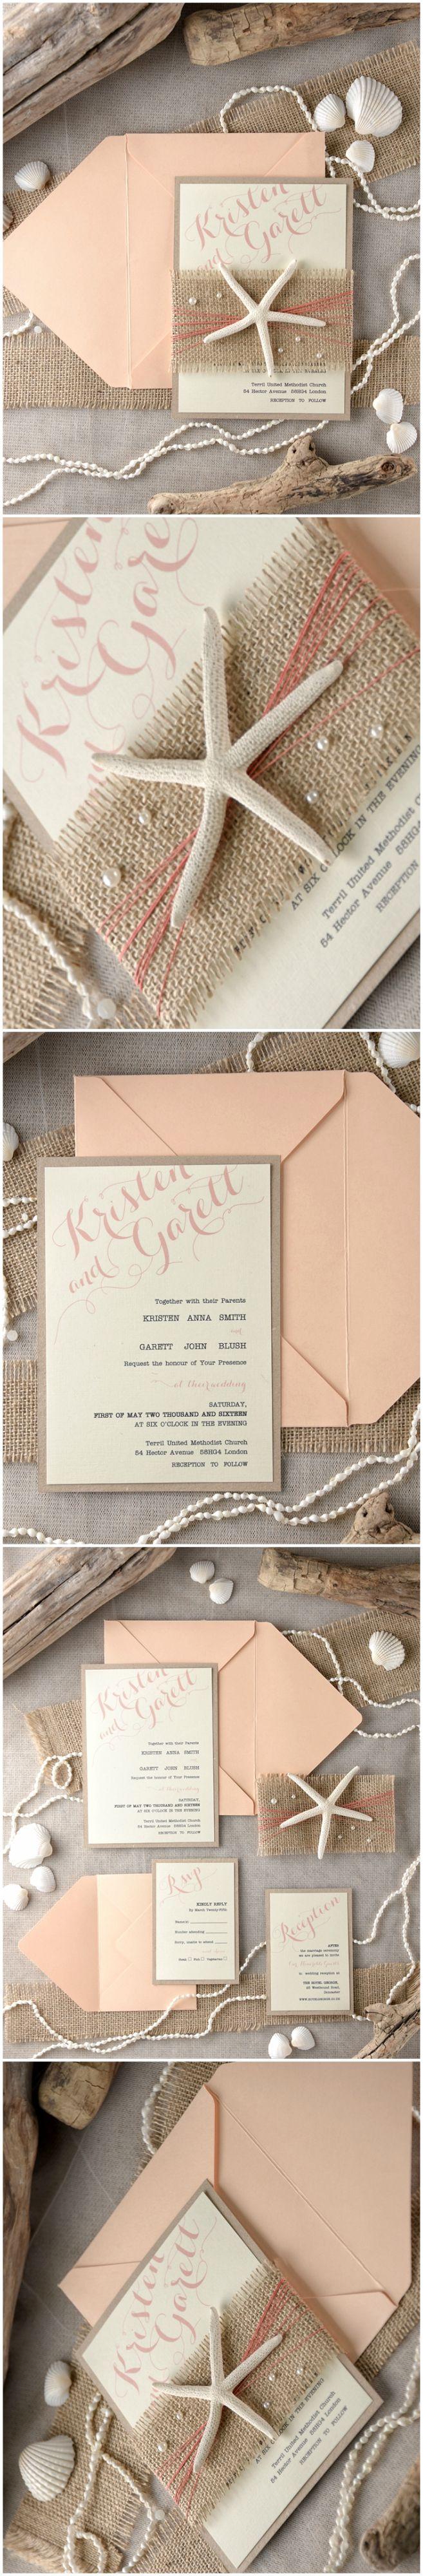 Beach Destination Wedding Invitation with real Starfish #beach #destinationwedding #starfish #peach #coral #weddingideas #weddinginvitations #romantic #rustic #eco #kraft